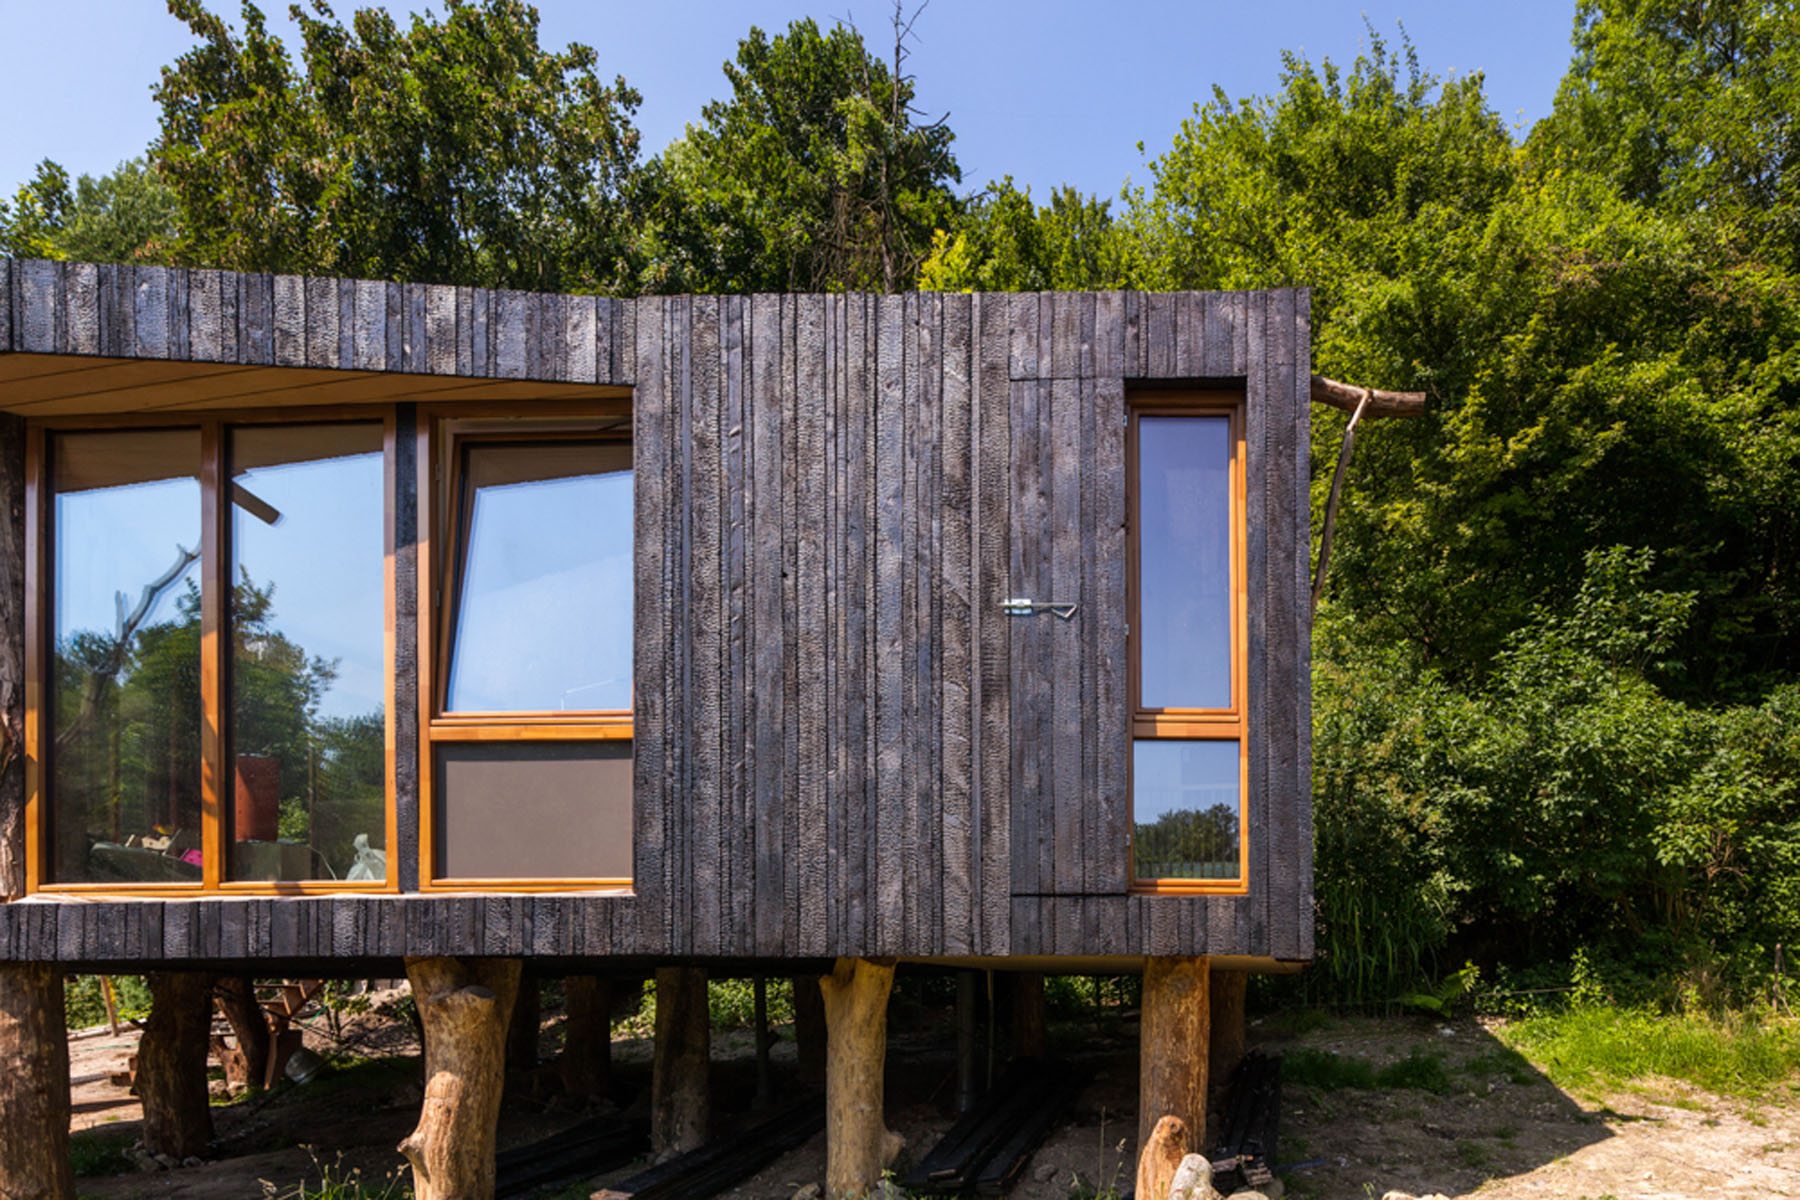 technique bois brul bois brule open the gallery bois. Black Bedroom Furniture Sets. Home Design Ideas